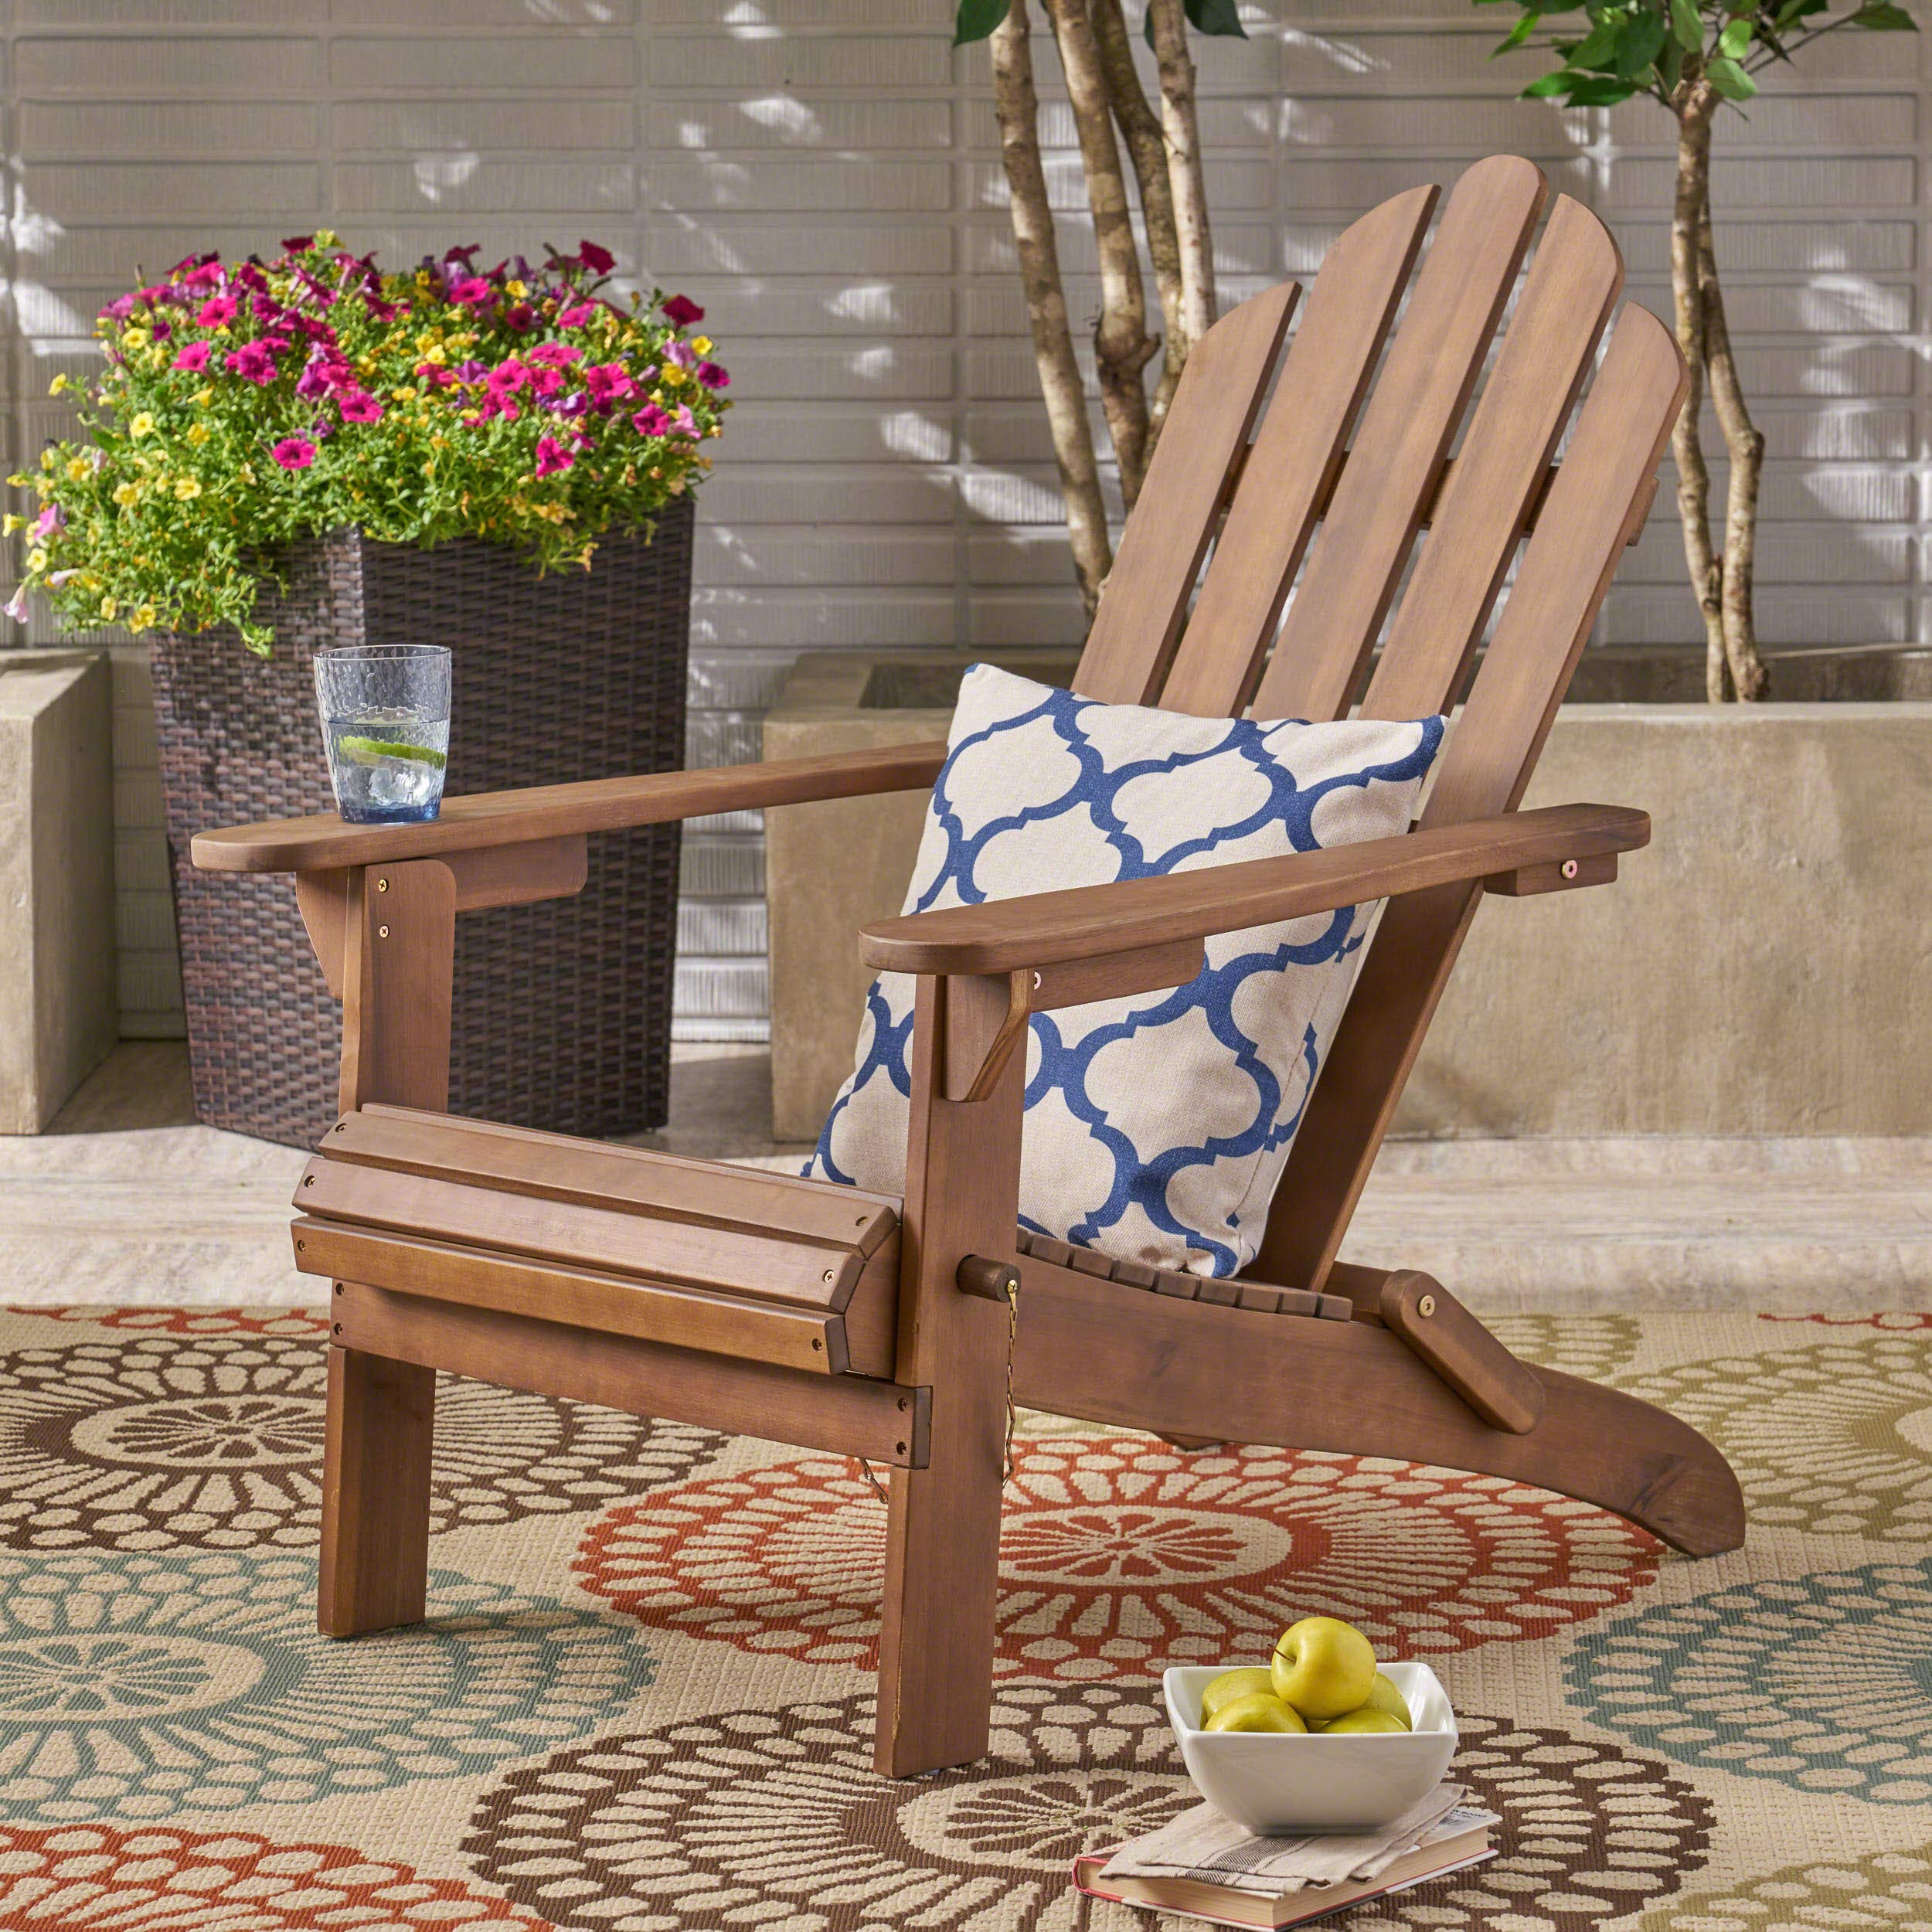 Christopher Knight Home 305374 Cara Outdoor Foldable Acacia Wood Adirondack Chair, Dark Brown Finish by Christopher Knight Home